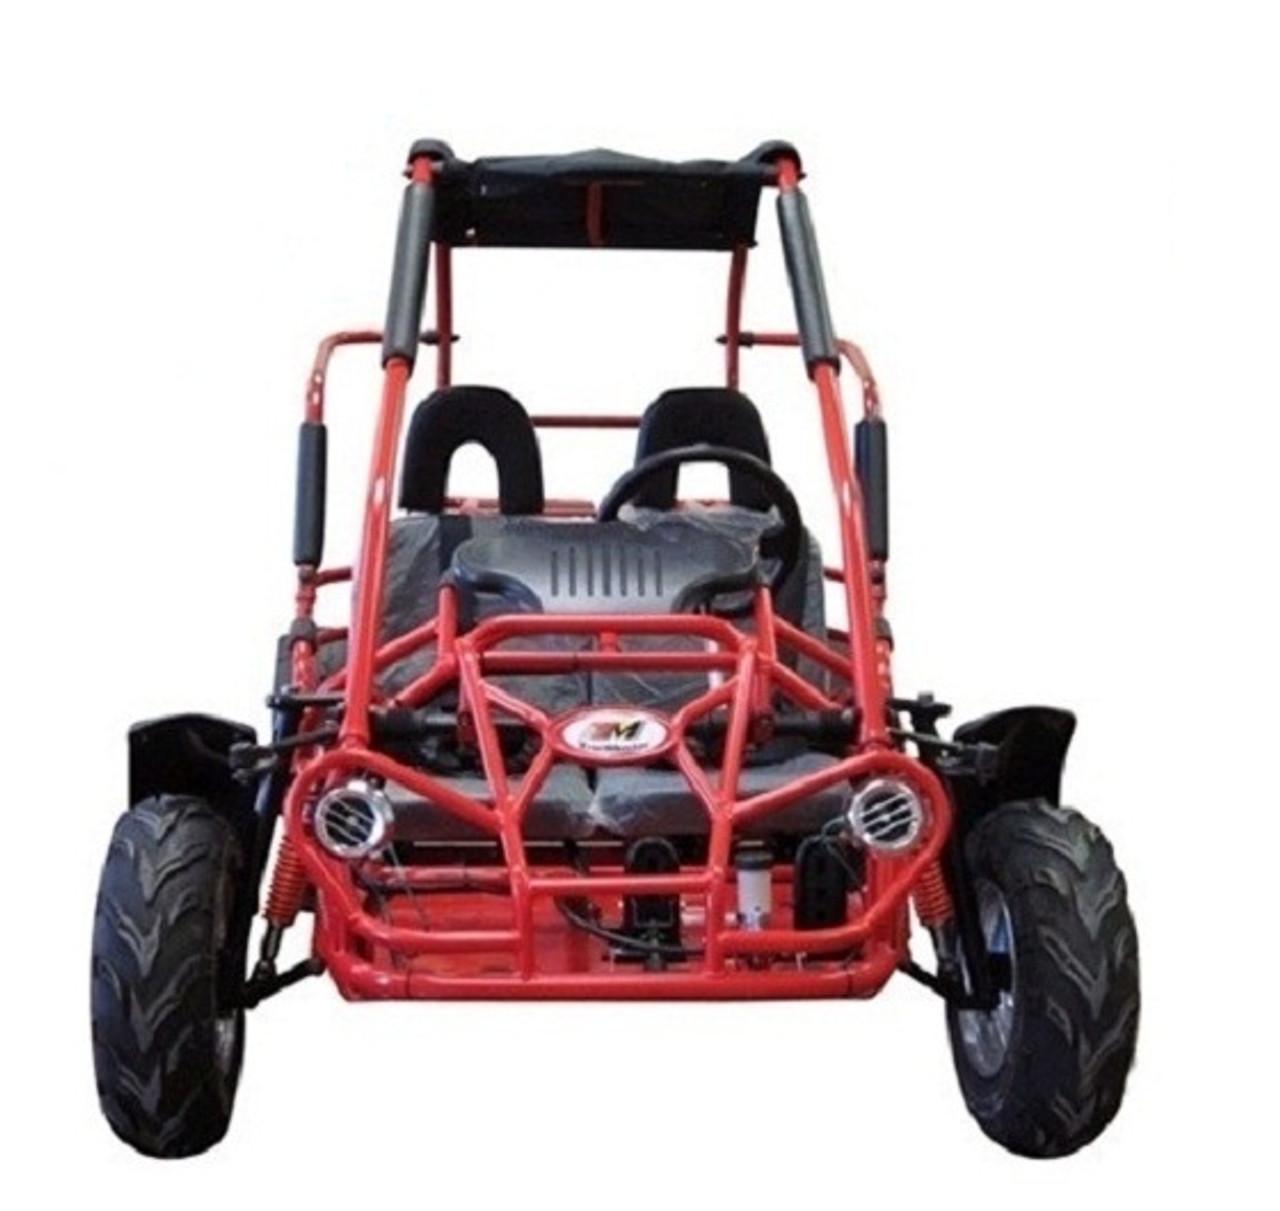 Trail Master MID XRX 200cc HIGH QUALITY GO KART W/ PULL START & ELECTRIC START